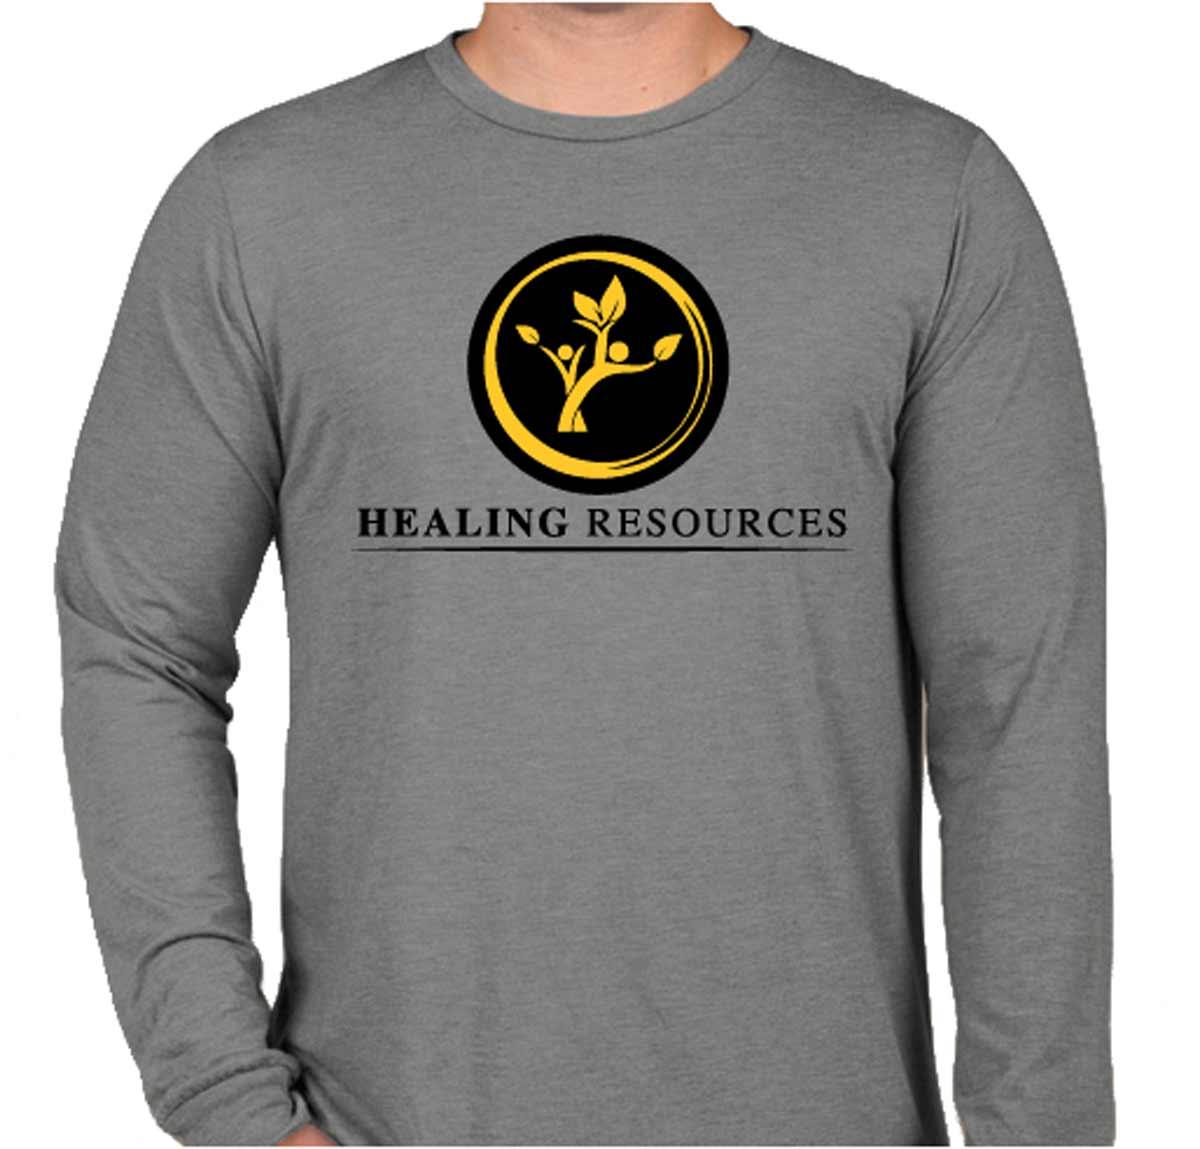 Healing Resources Long Sleeve Shirt